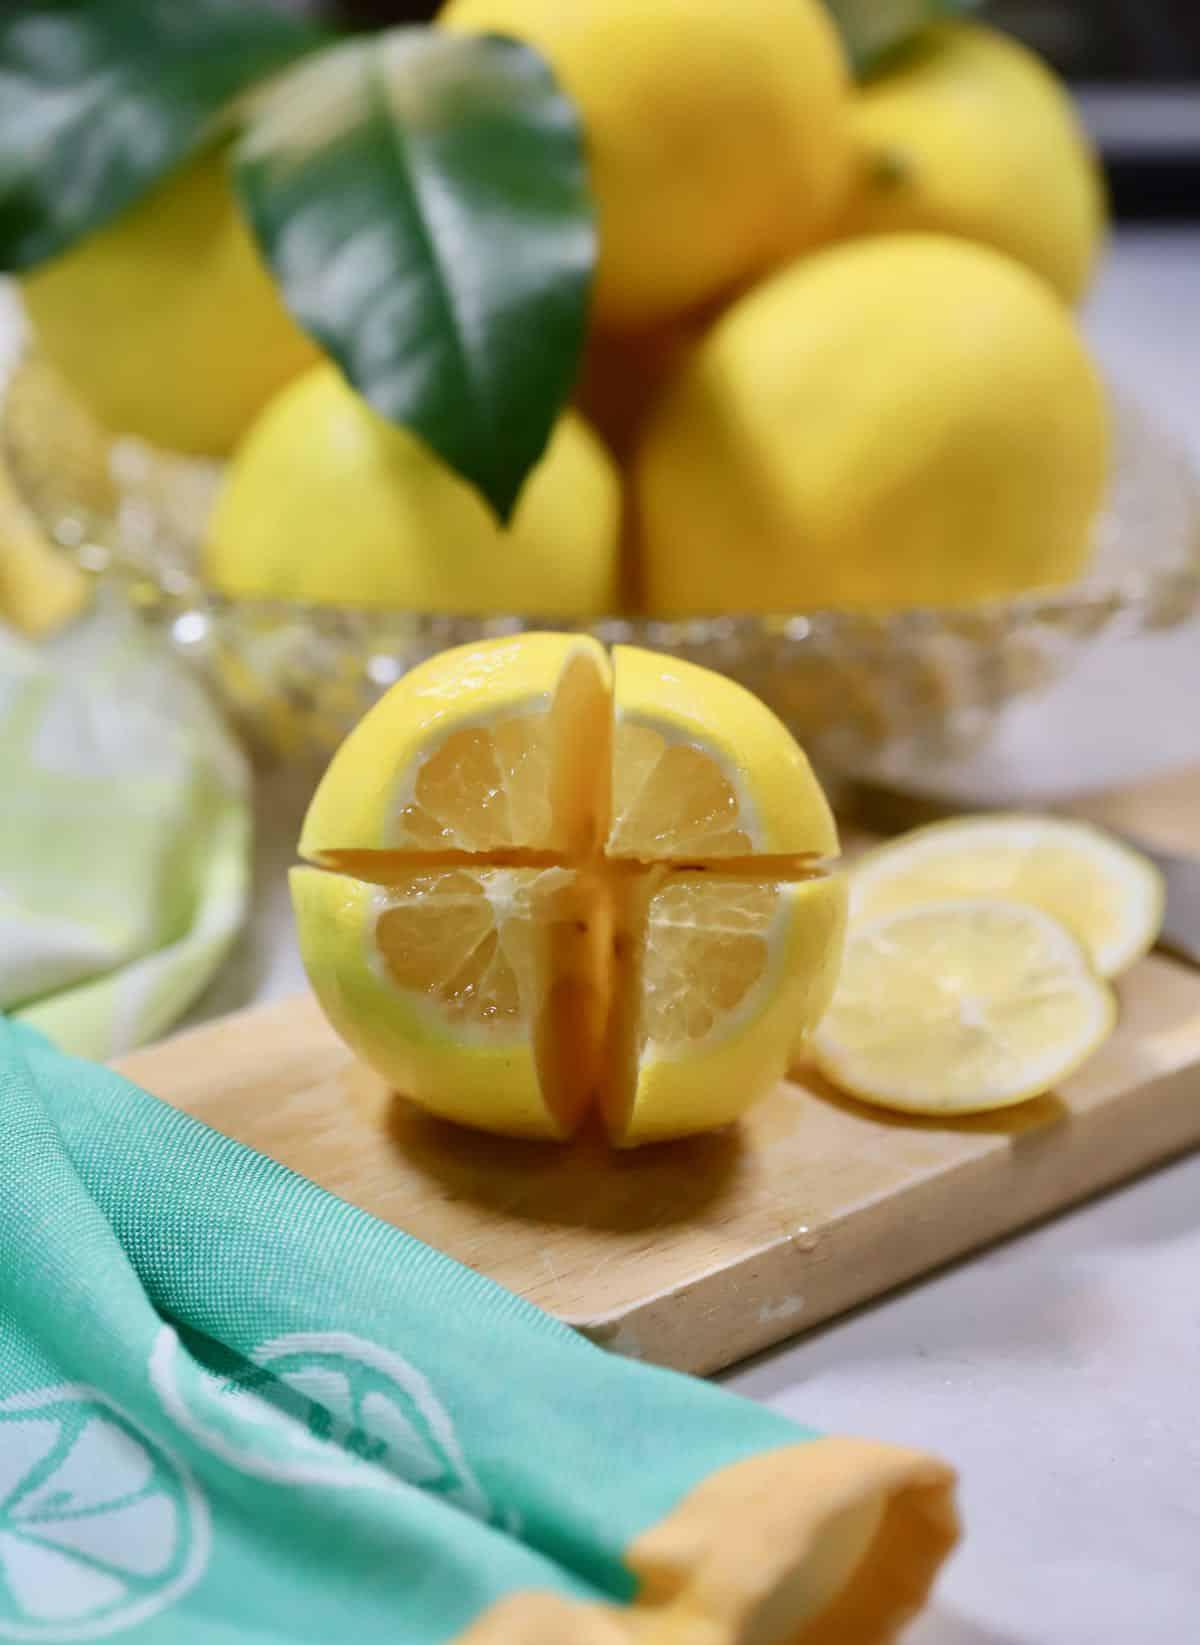 A lemon cut into quarters on a cutting board.